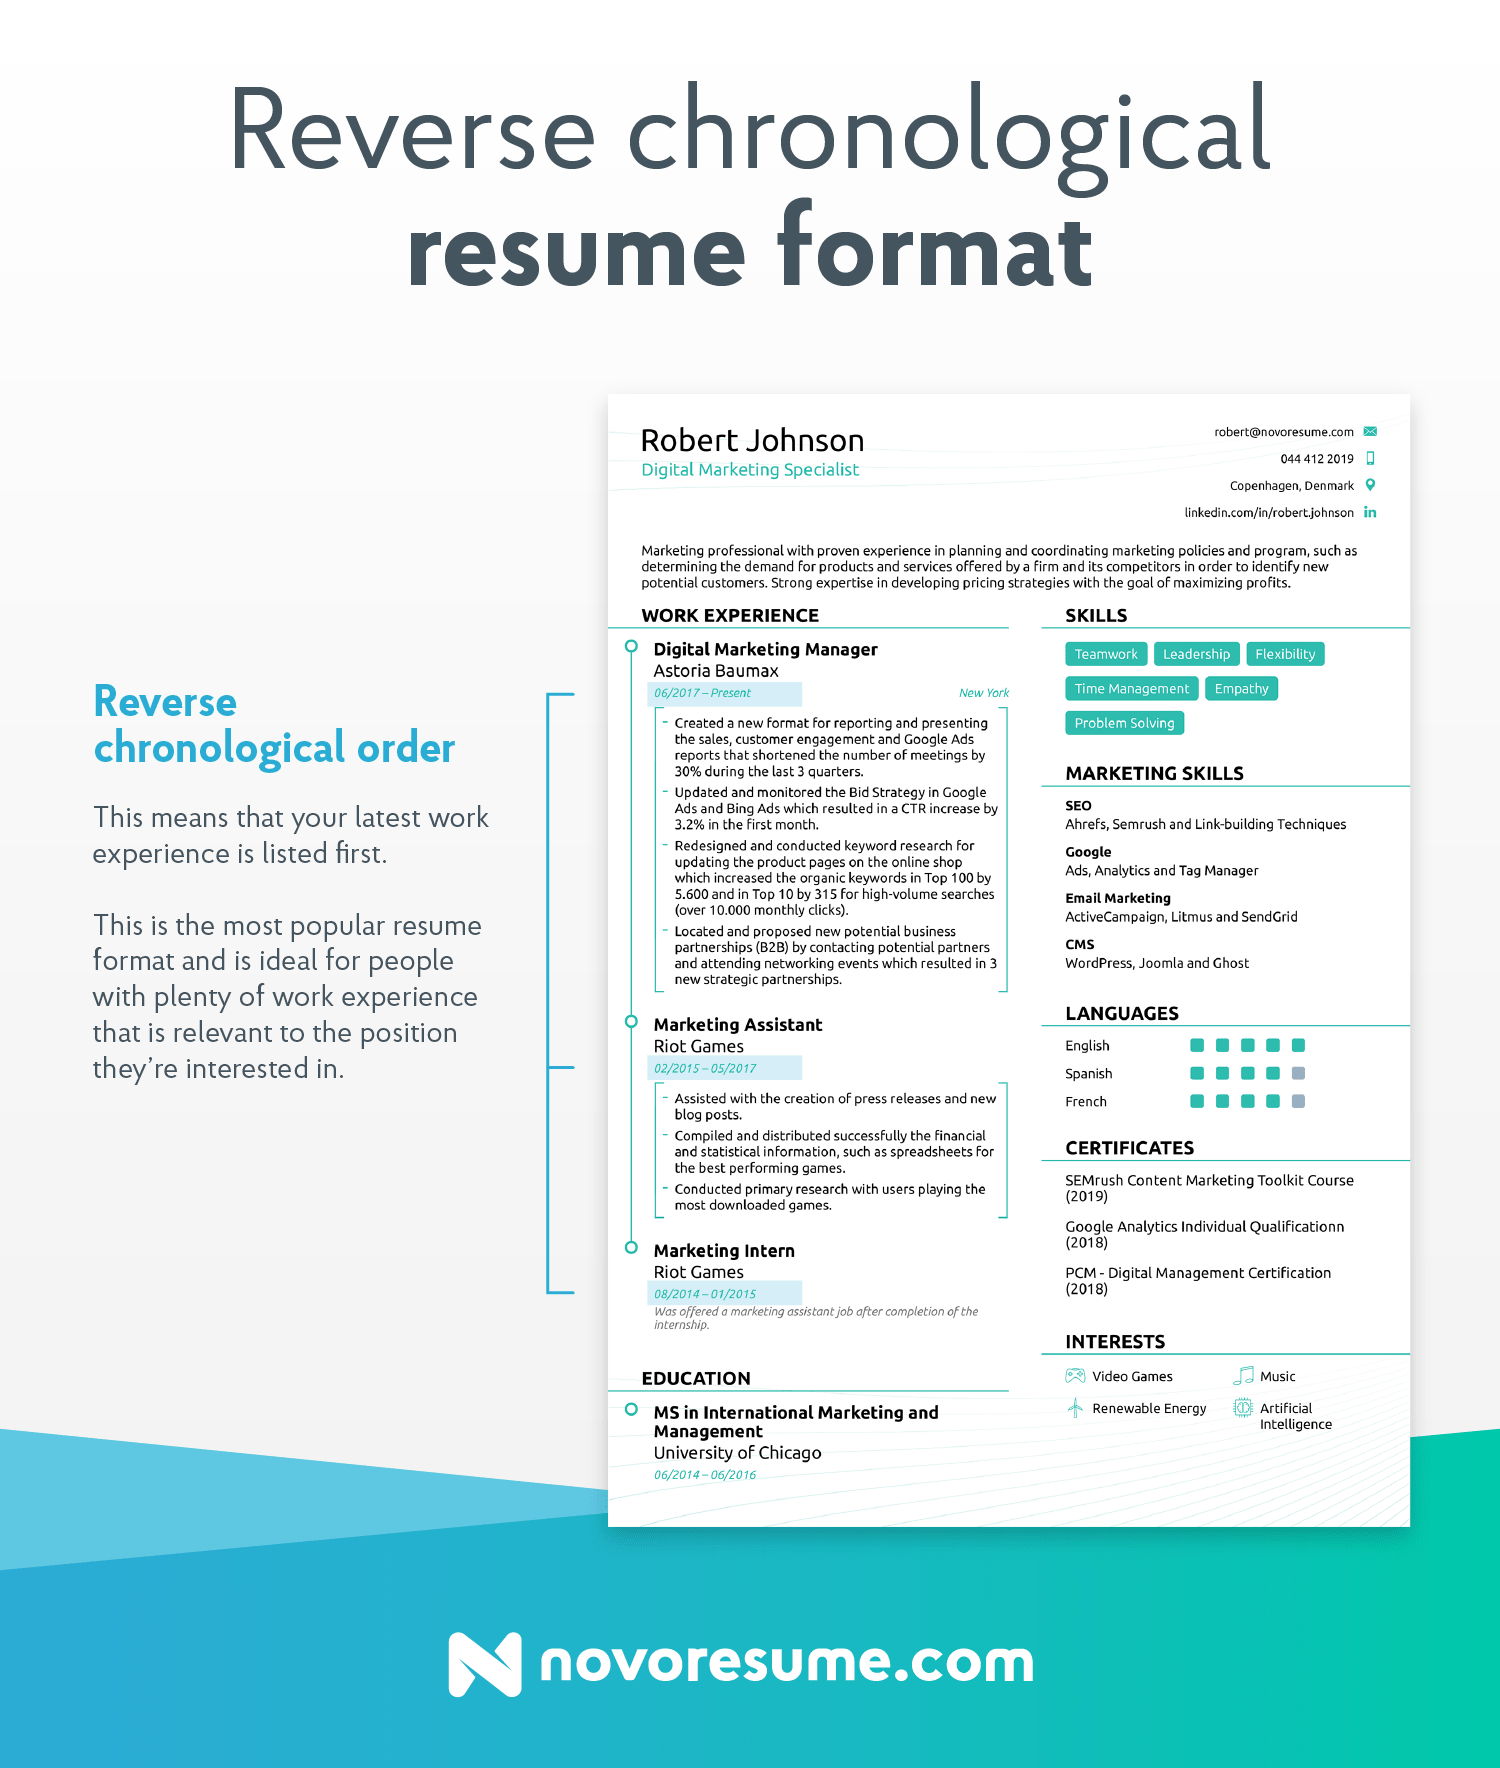 data scientist reverse chronological format